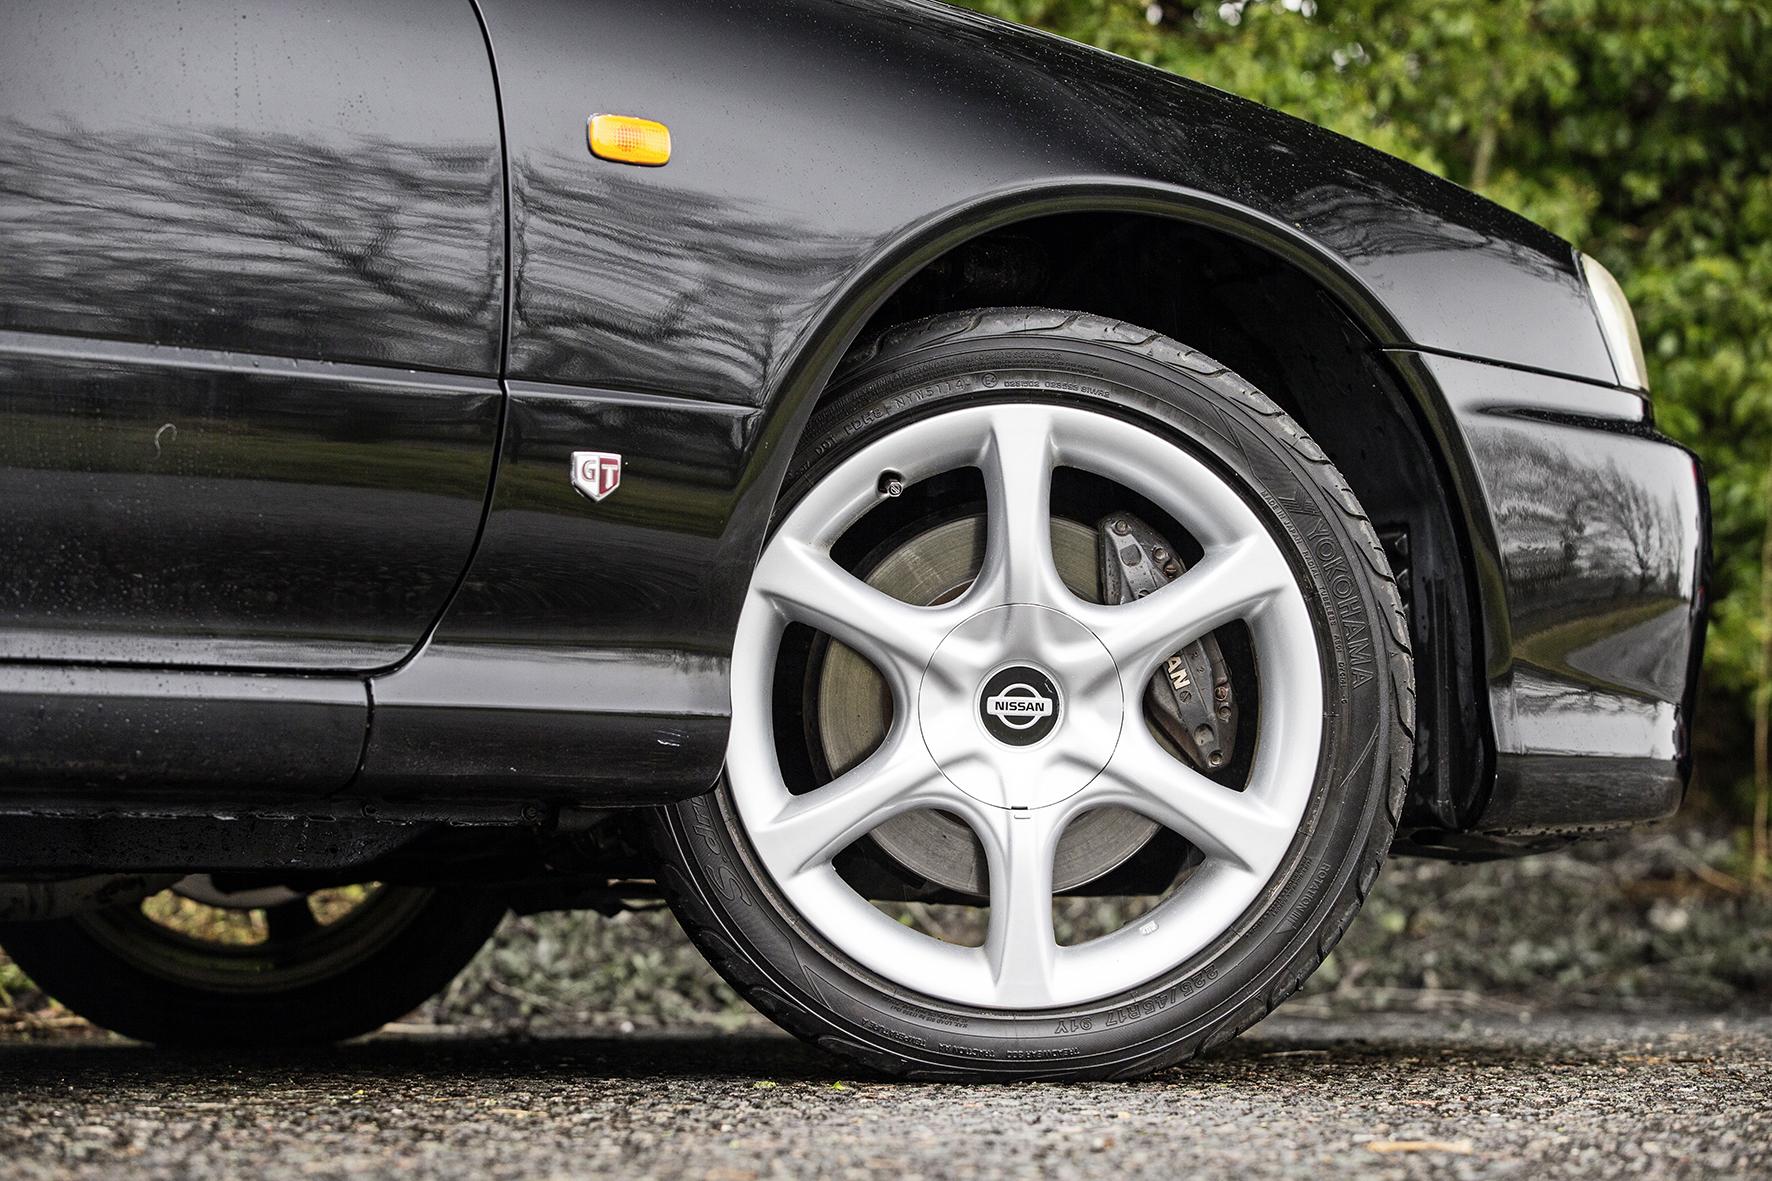 Nissan-Alloy-Wheels.jpg